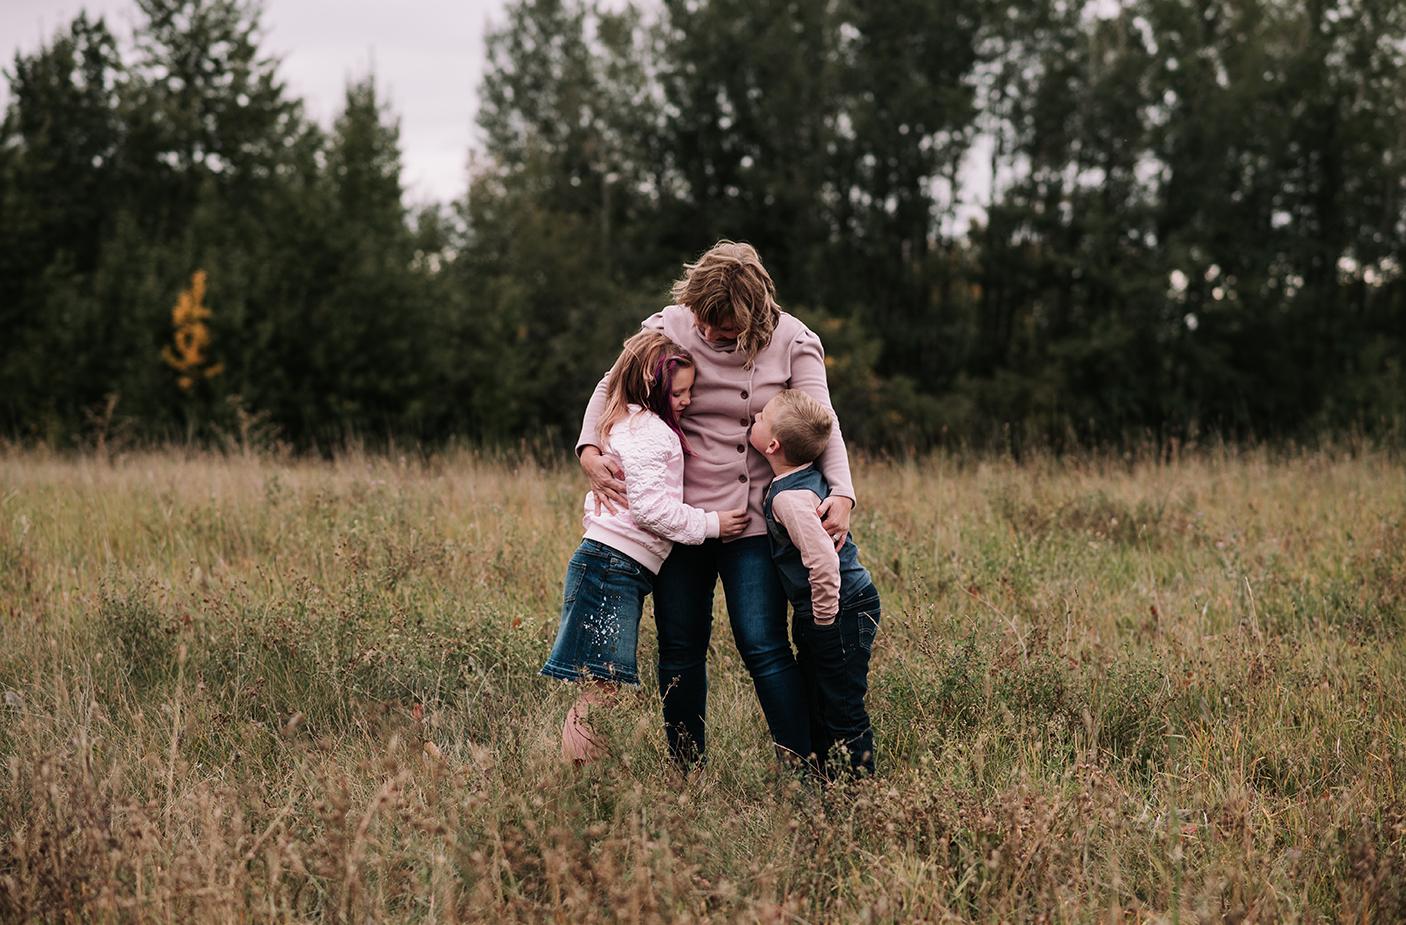 Family-Mini-Sessions-2019.jpg